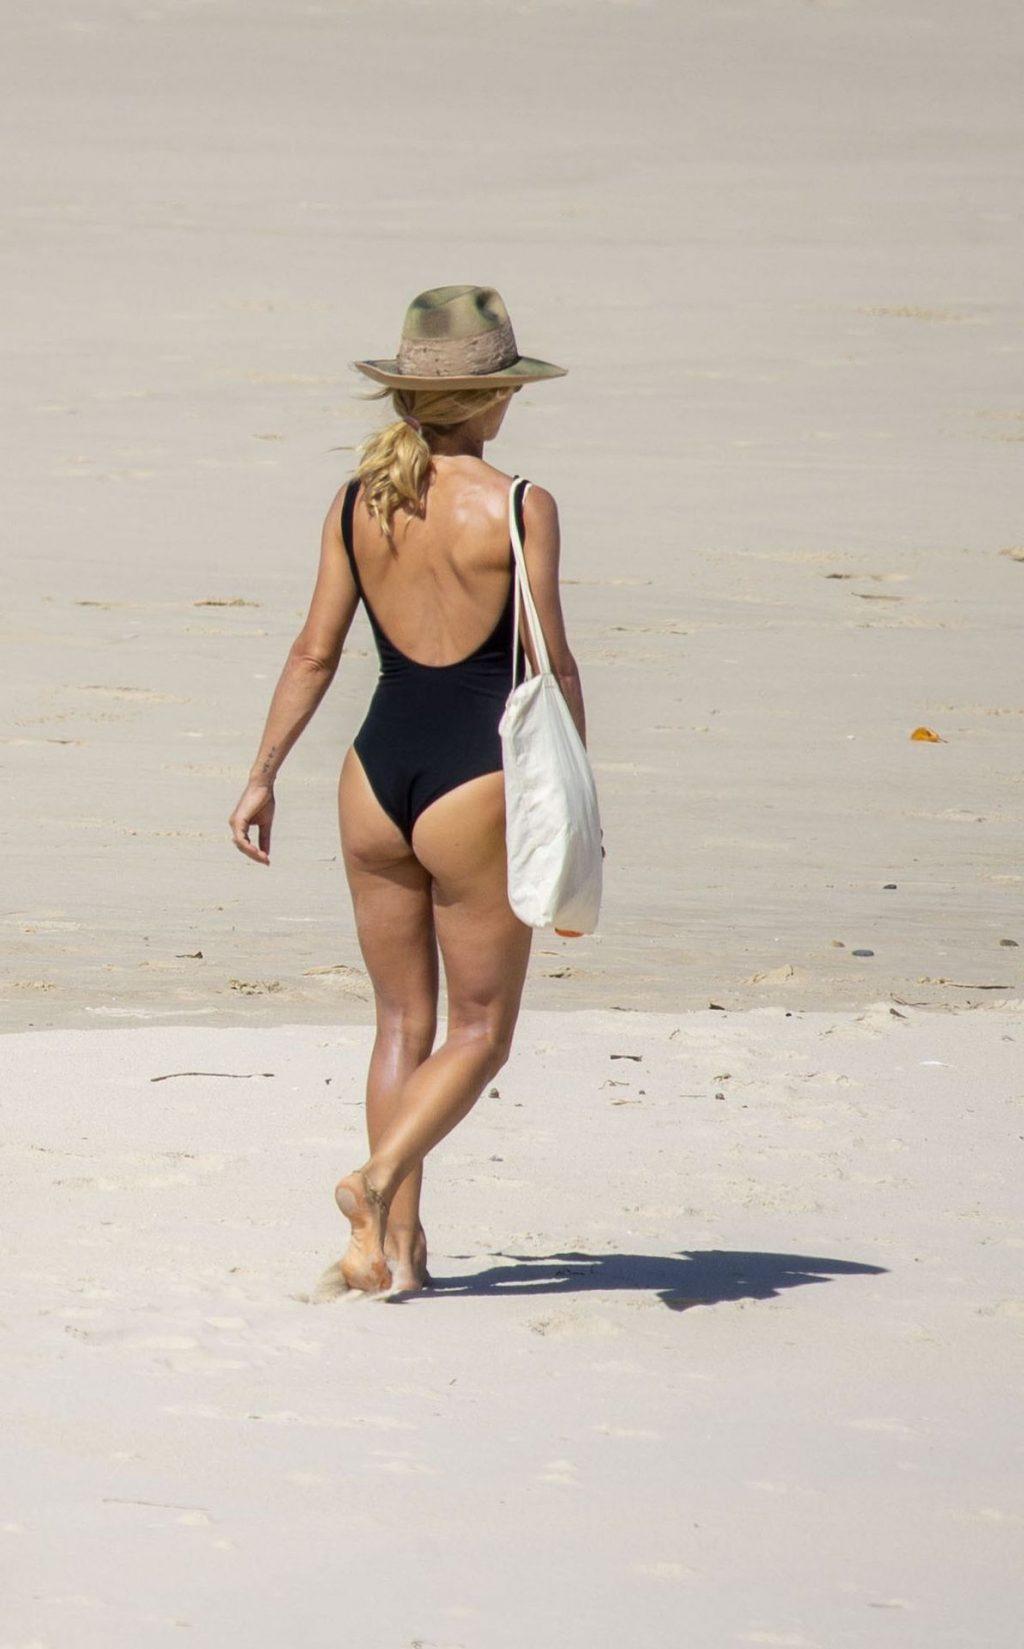 Chris Hemsworth & Elsa Pataky Took Some Time on the Beach (26 Photos)